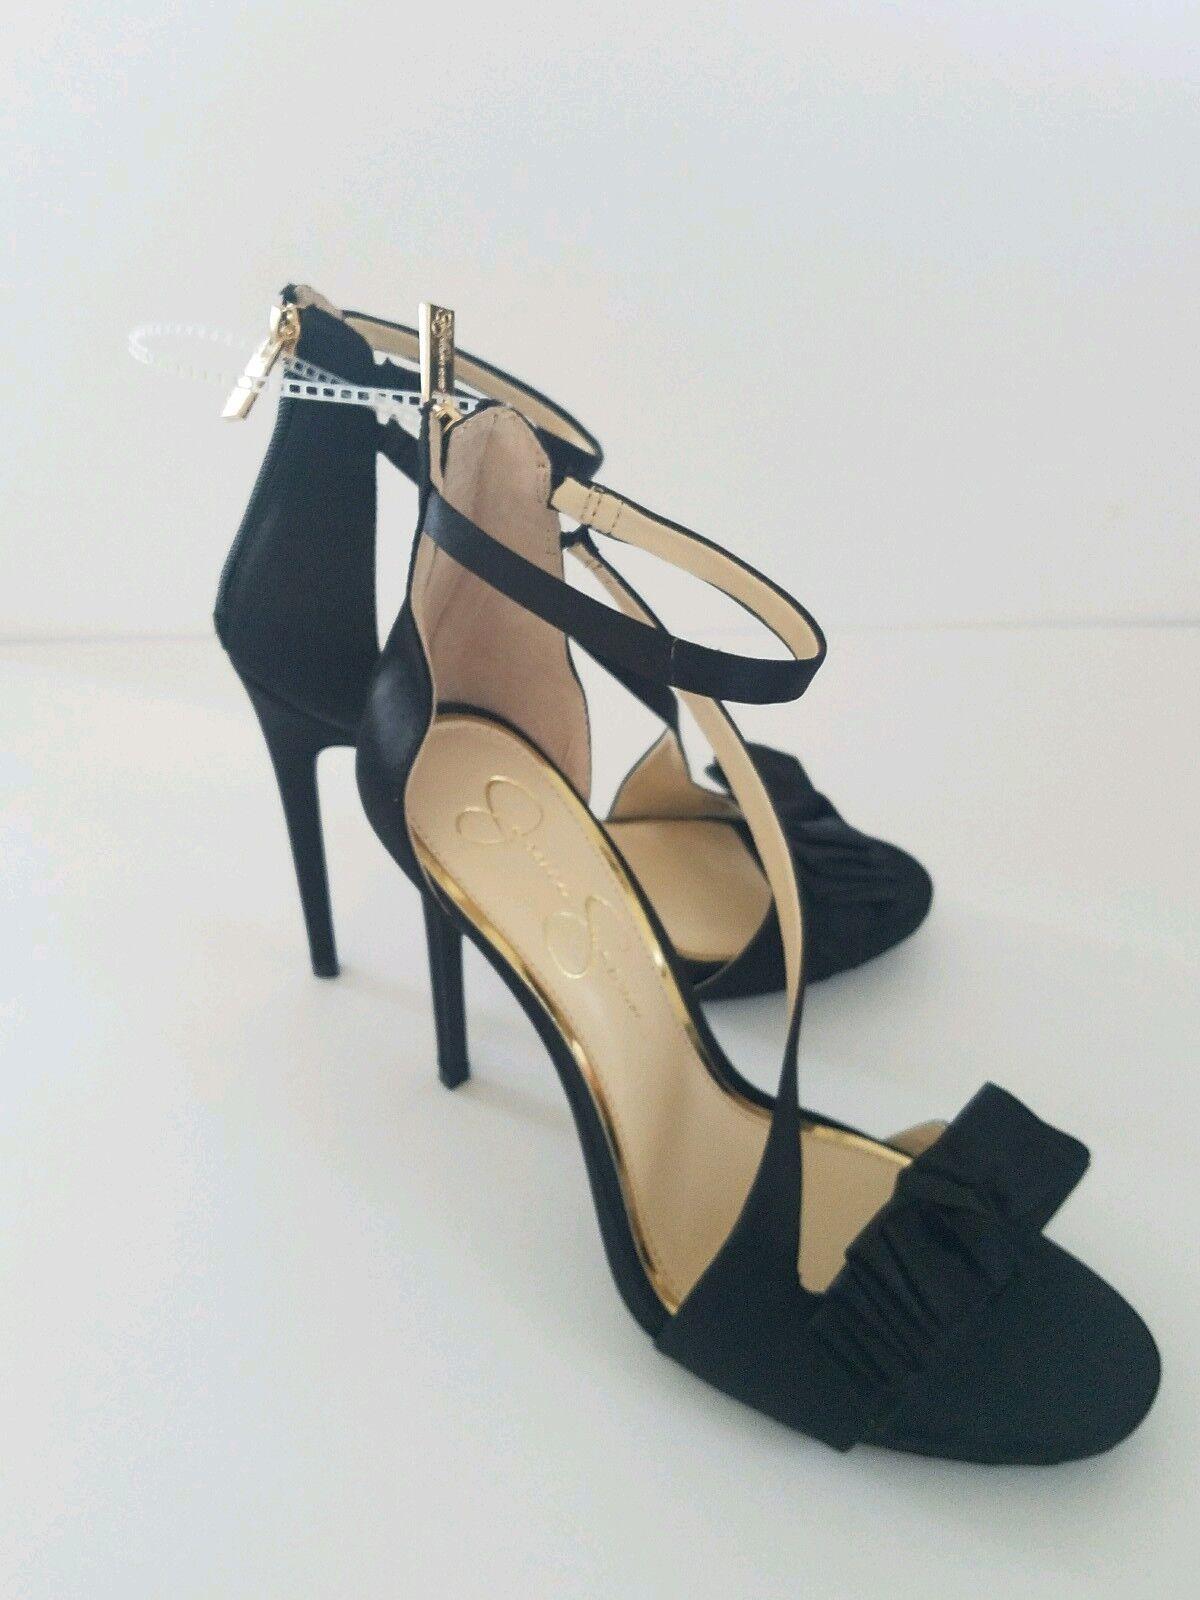 Jessica crystal simpson damen high heels sleenback crystal Jessica satin schwarz schuhe Größe 8.5 8502ad